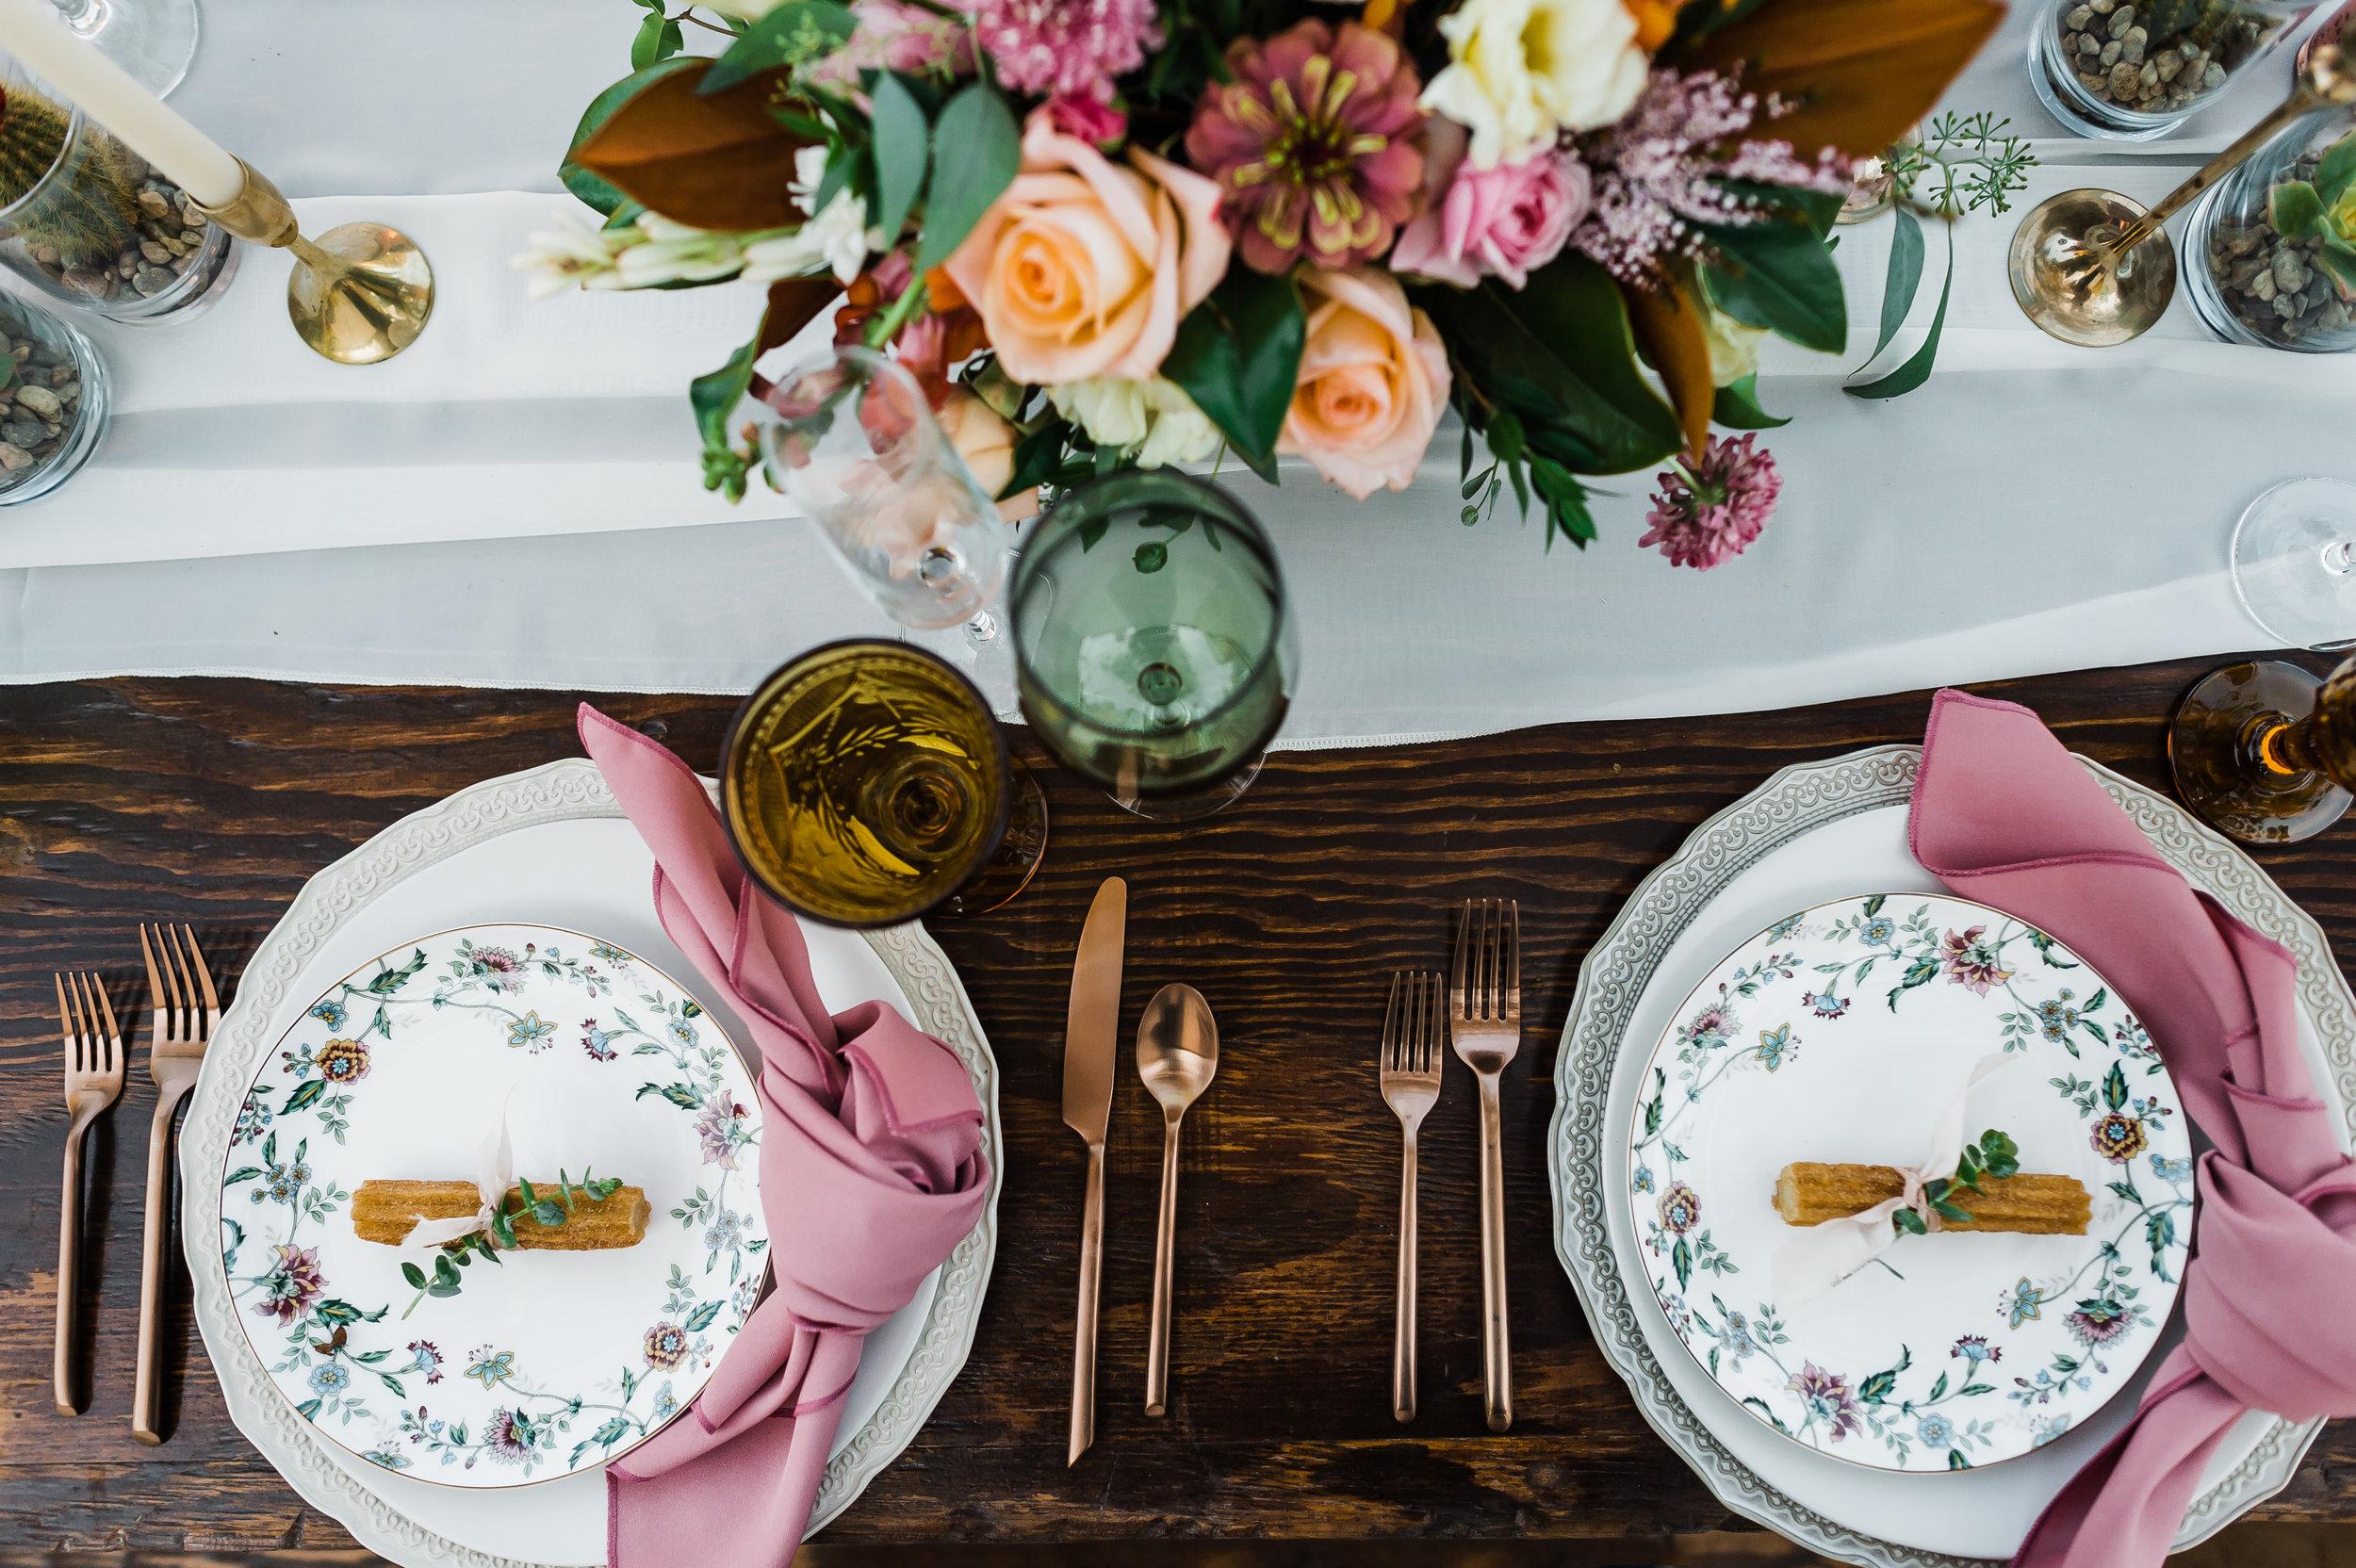 www.santabarbarawedding.com | Michelle Ramirez Photography | Olivas Adobe | Karen Marie Events | Tangled Lotus | Amigo Party Rentals | Dreams America Linens | Erickson Surfaces | Table Place Settings